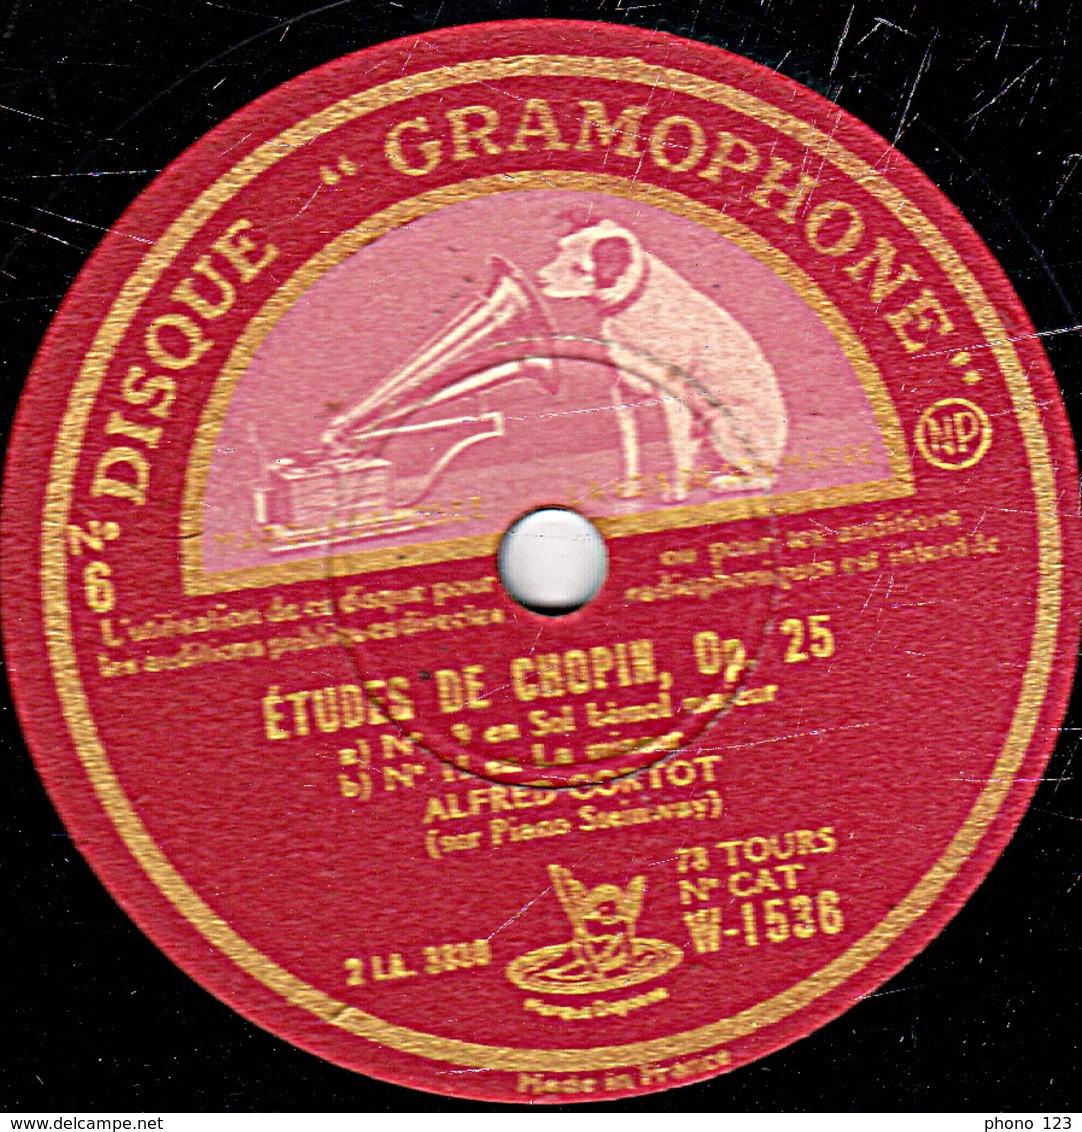 78 Trs - 30 Cm - état B - ETUDES N°7 En Do Dièse Mineur Op.25 - N°9 En Sol Bémol Majeur Et N°11 En La Mineur (Chopin) - 78 Rpm - Schellackplatten